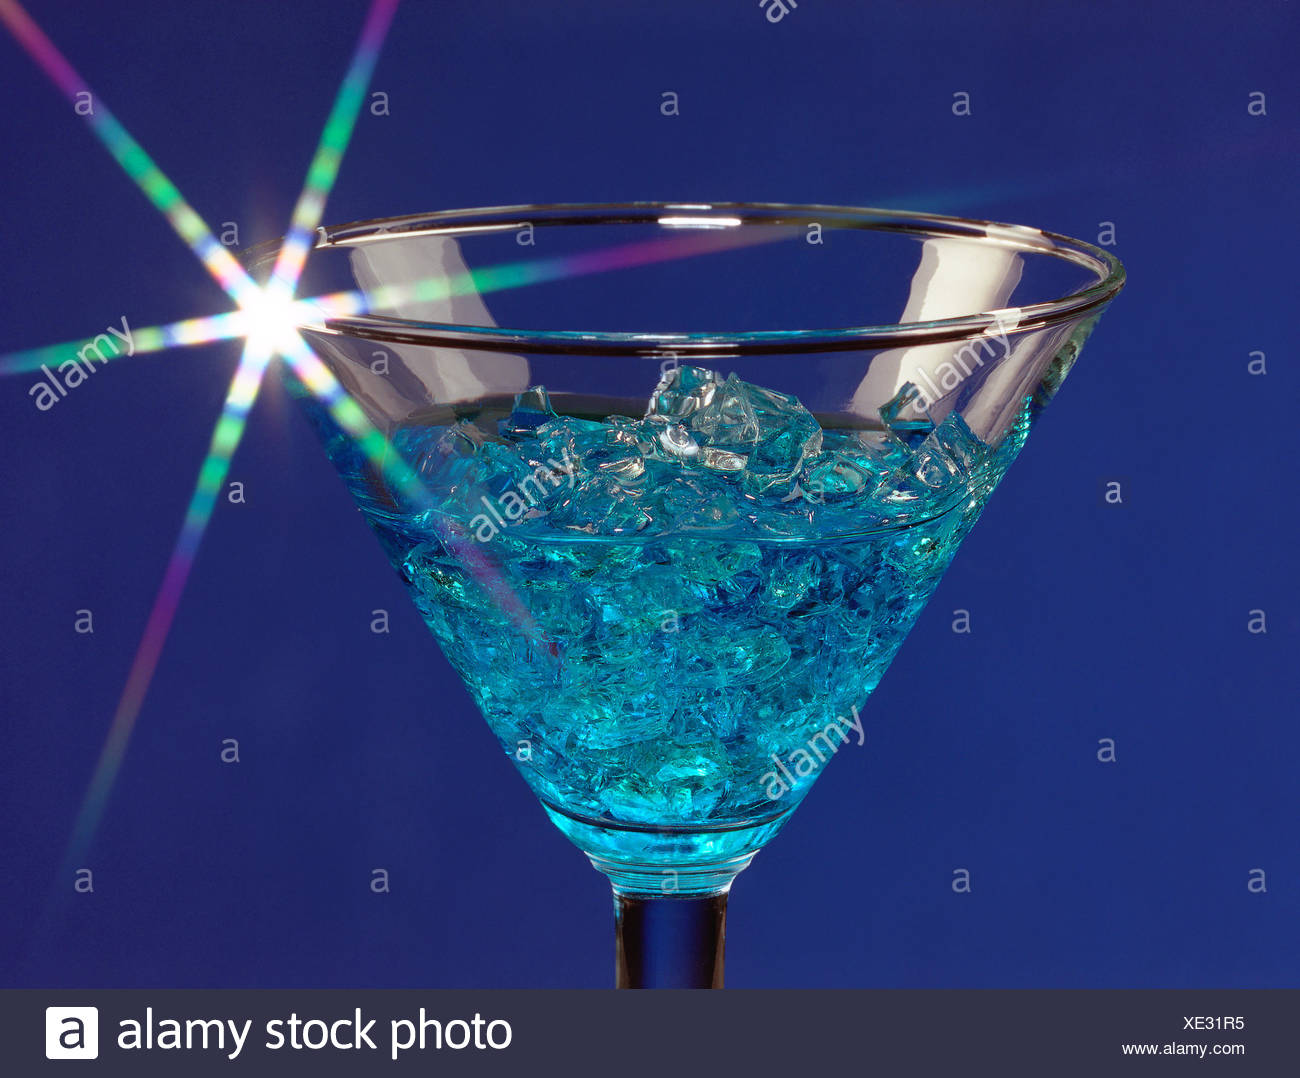 blue devil cocktail Stock Photo: 284038361 - Alamy